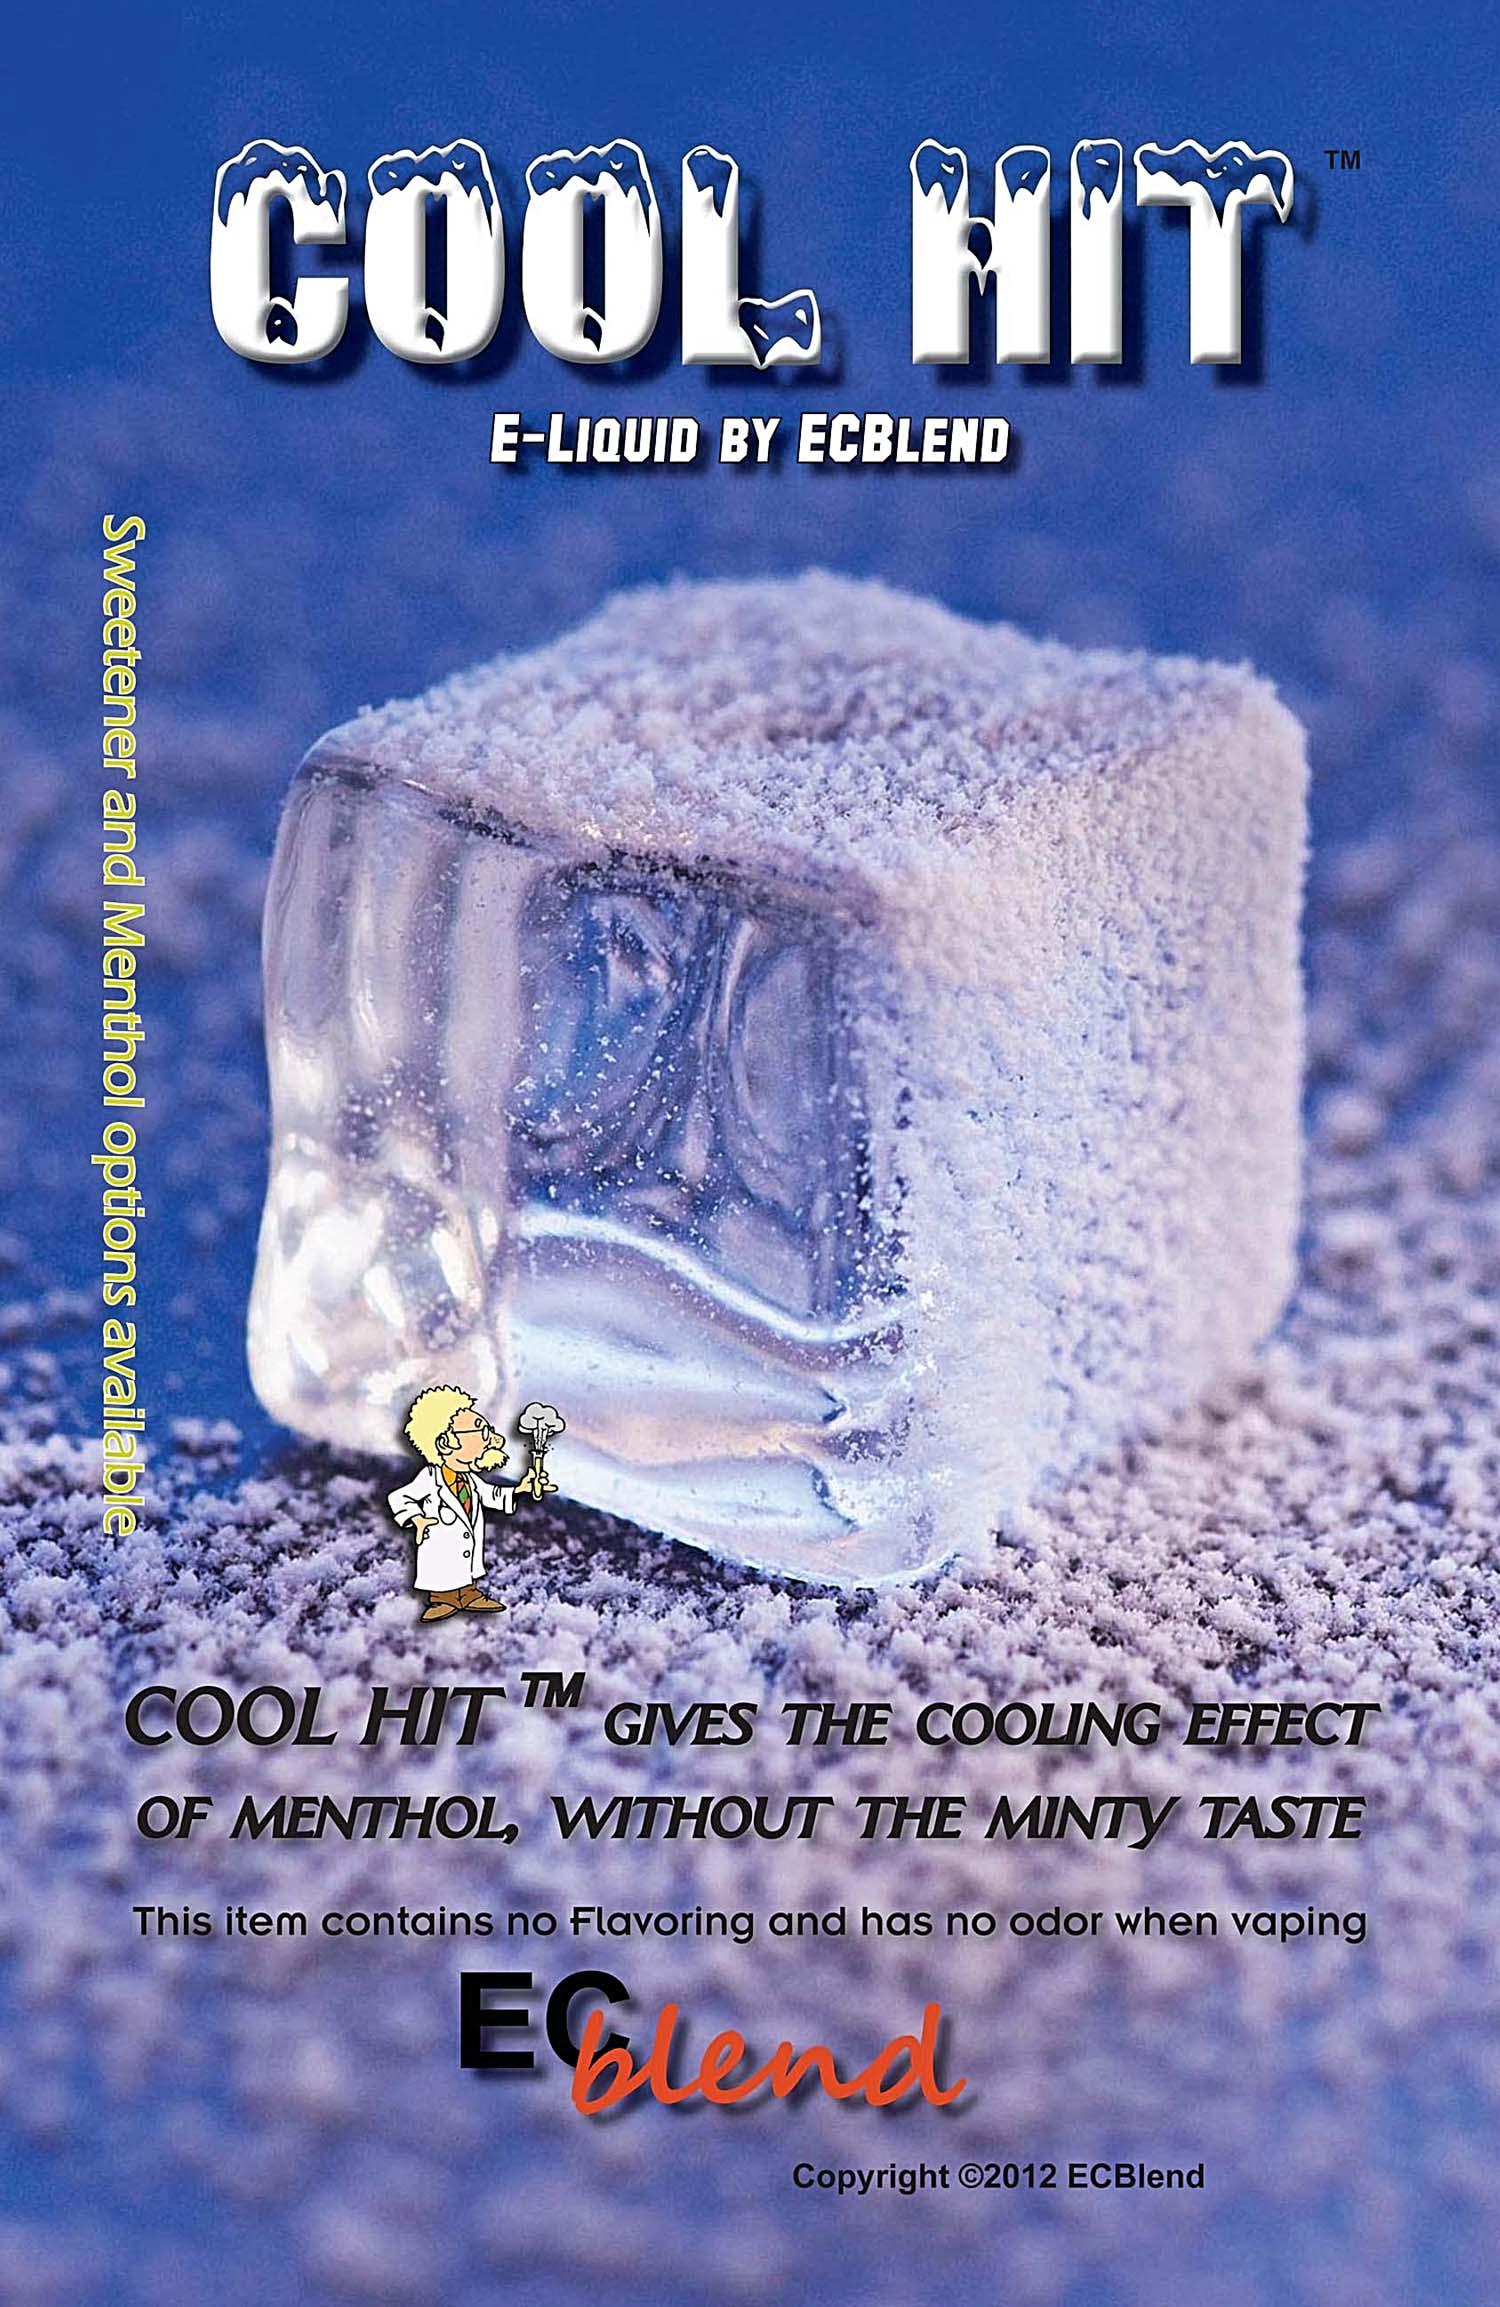 Cool Hit Eliquid by ECblend